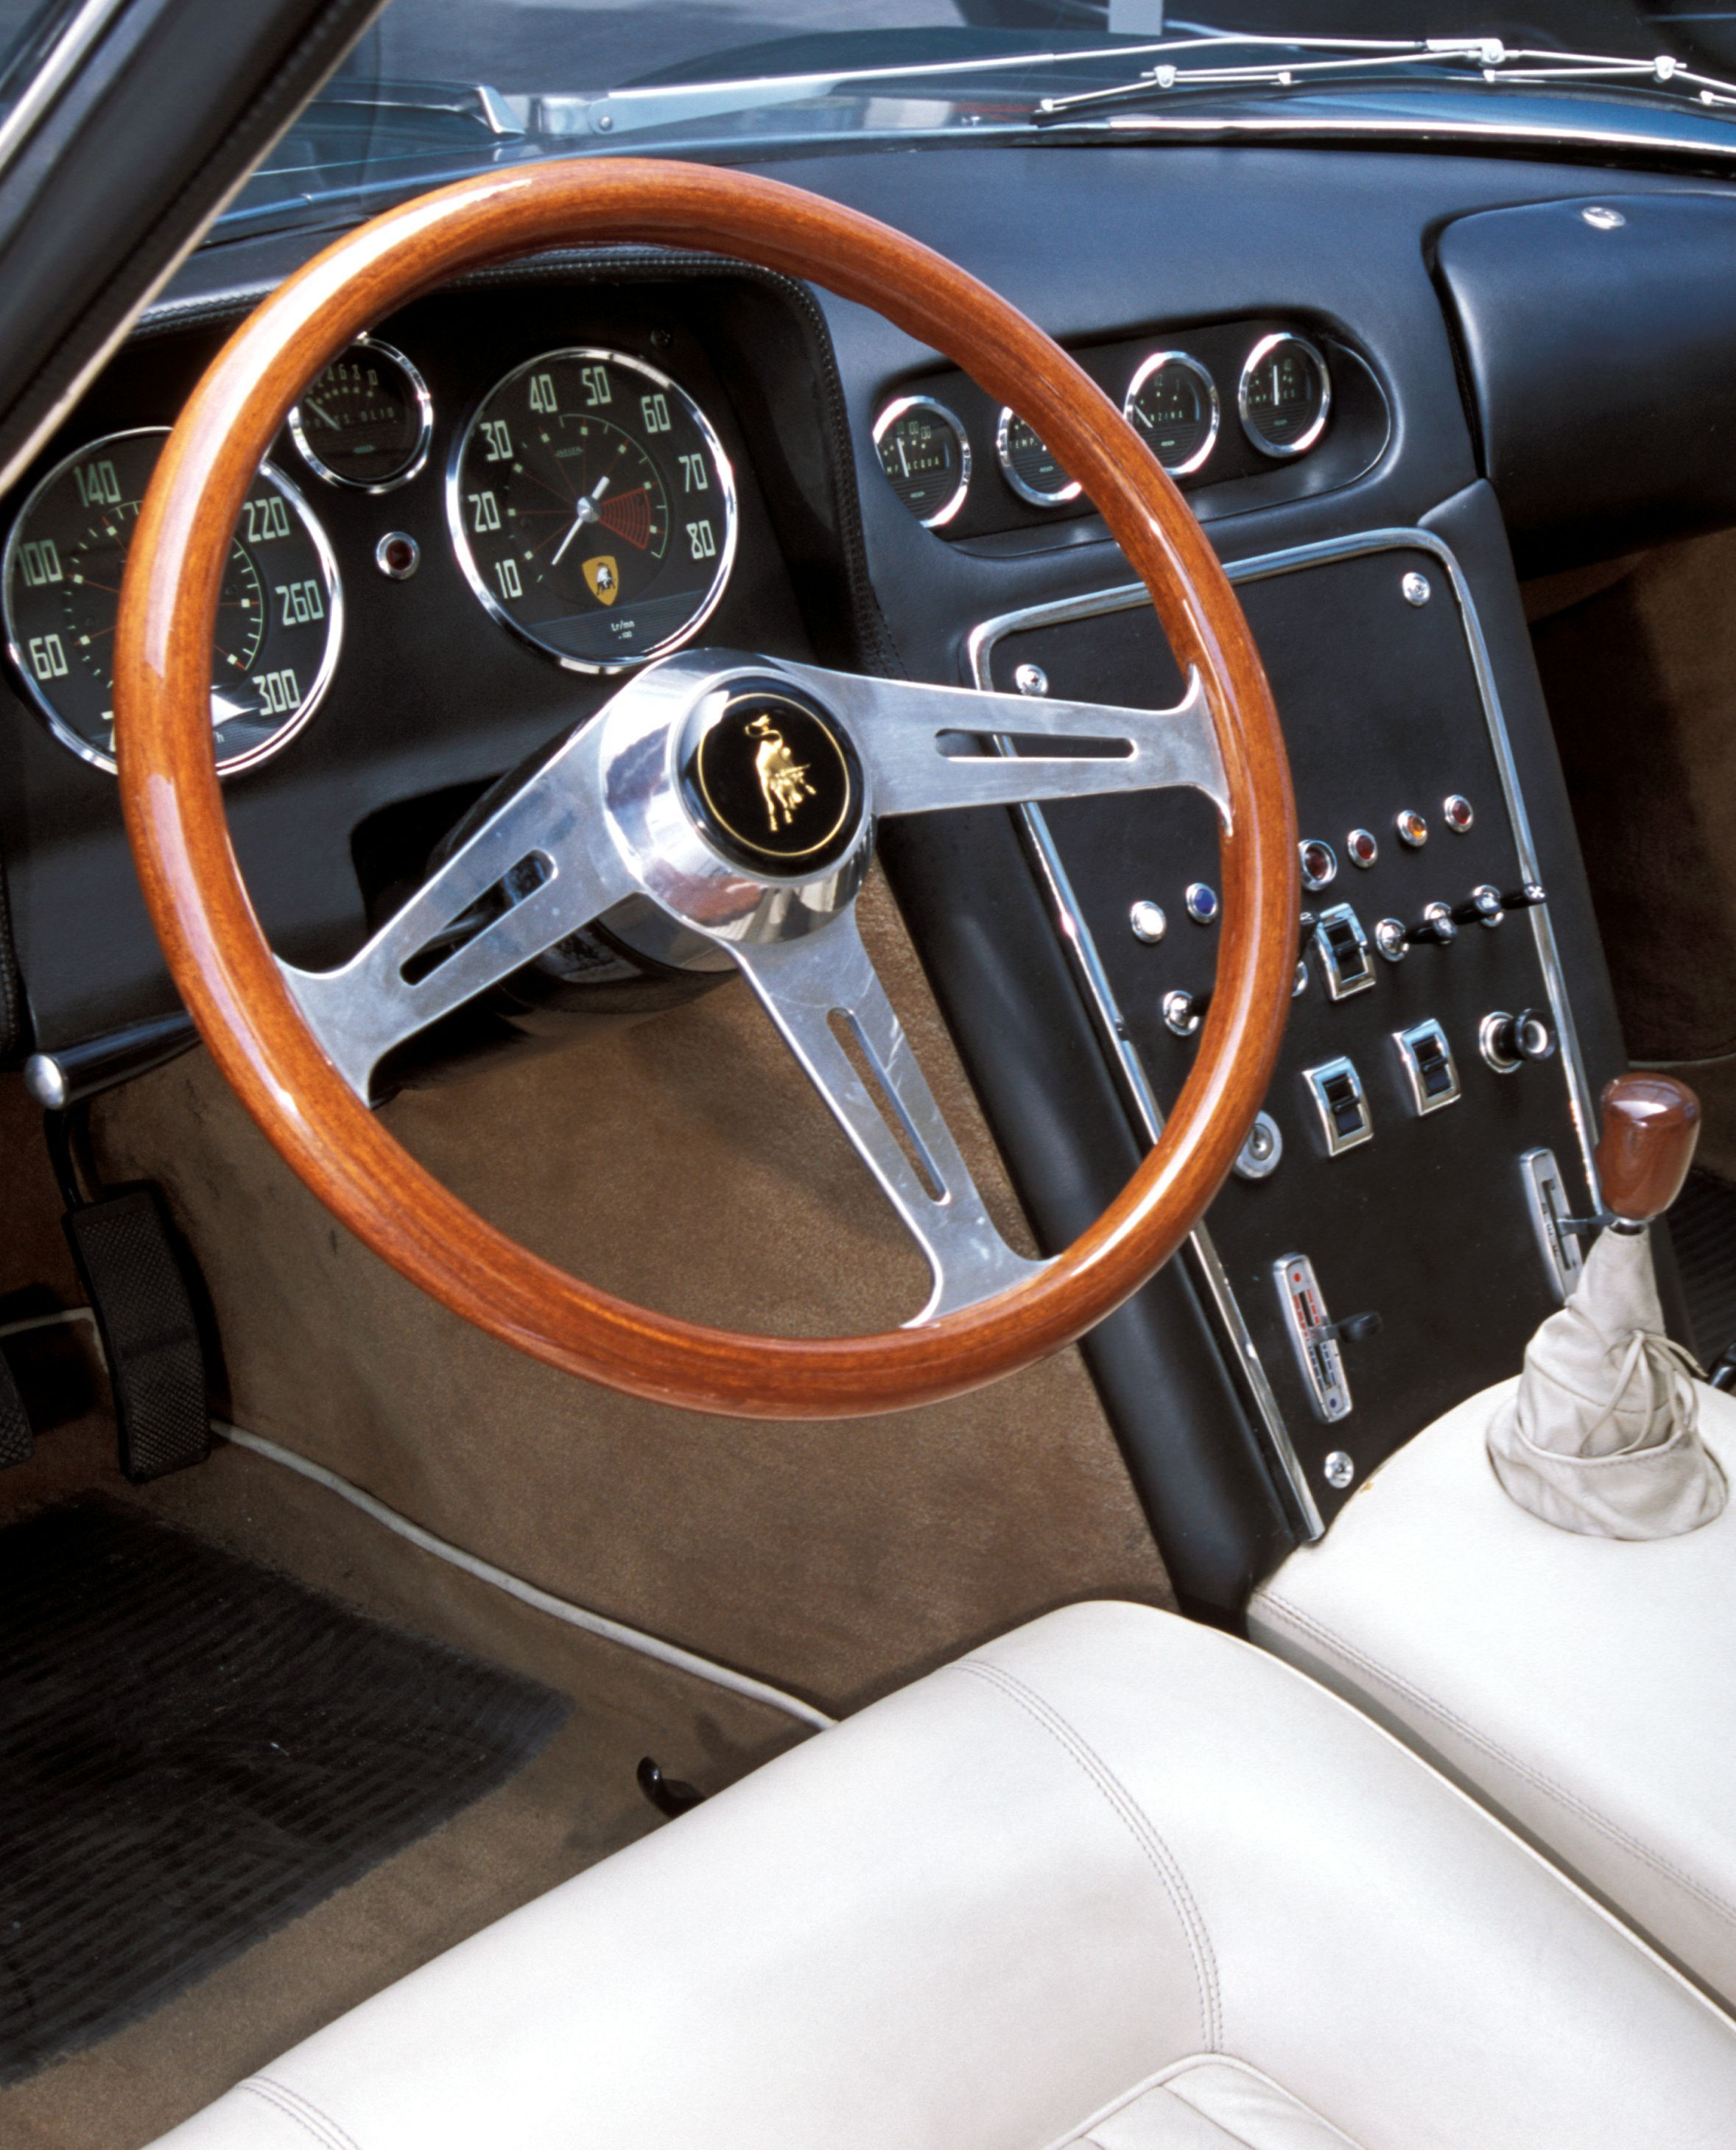 Lamborghini Aventador Interior: A Step Up From Tractors. Luxurious Interior Of 350 GTV